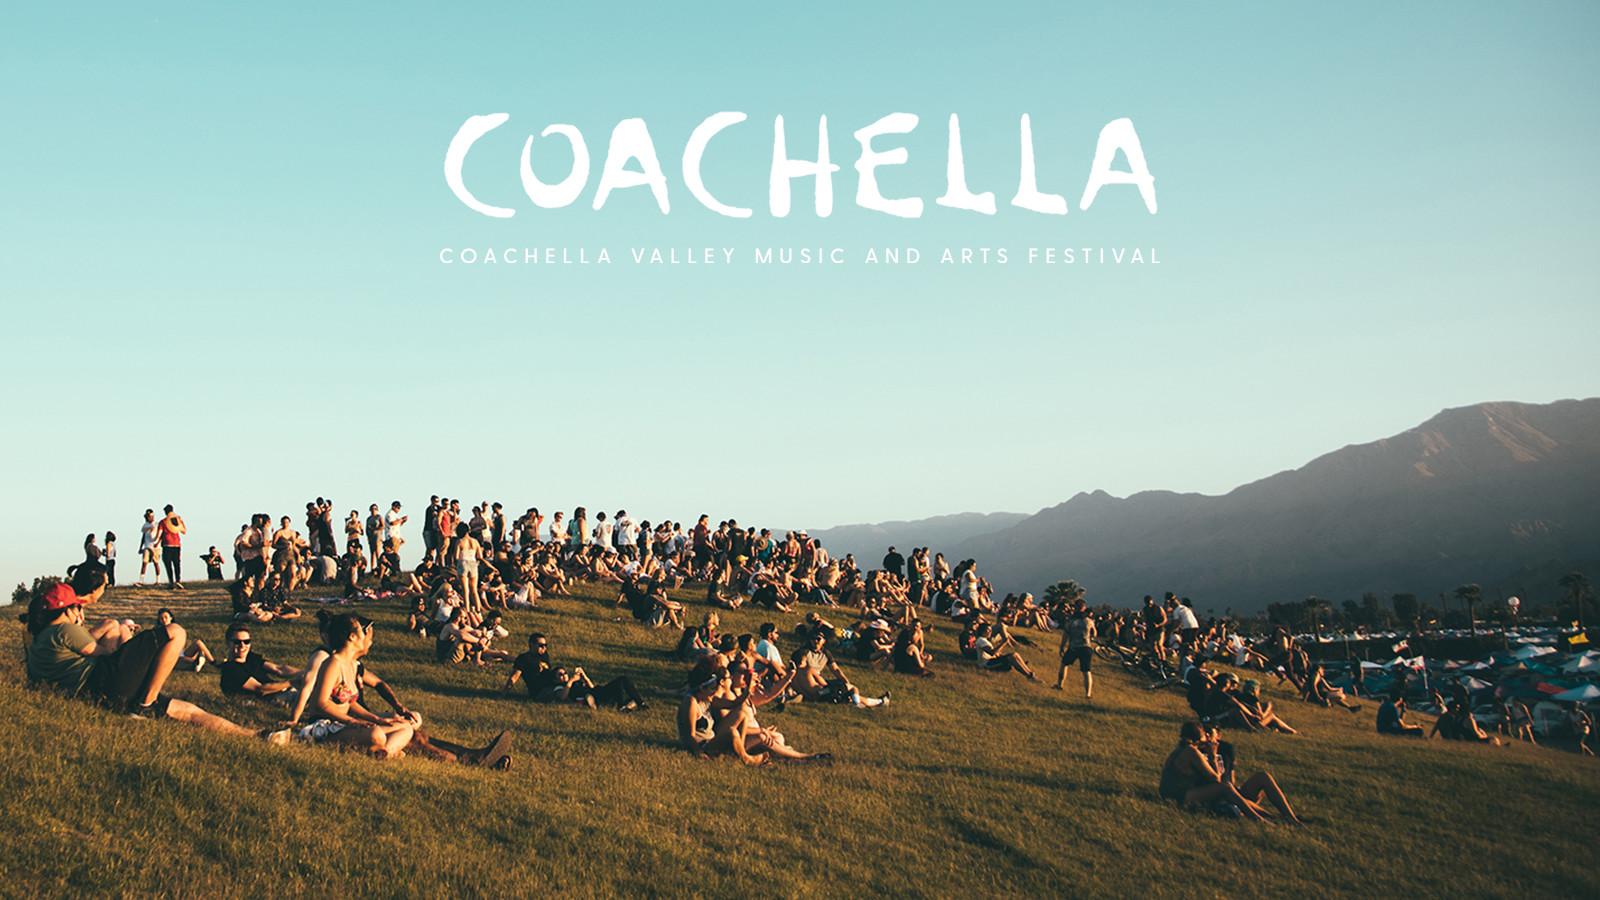 Eminem Wallpaper Iphone 5 How To Stream Coachella 2018 On Iphone Ipad Apple Tv